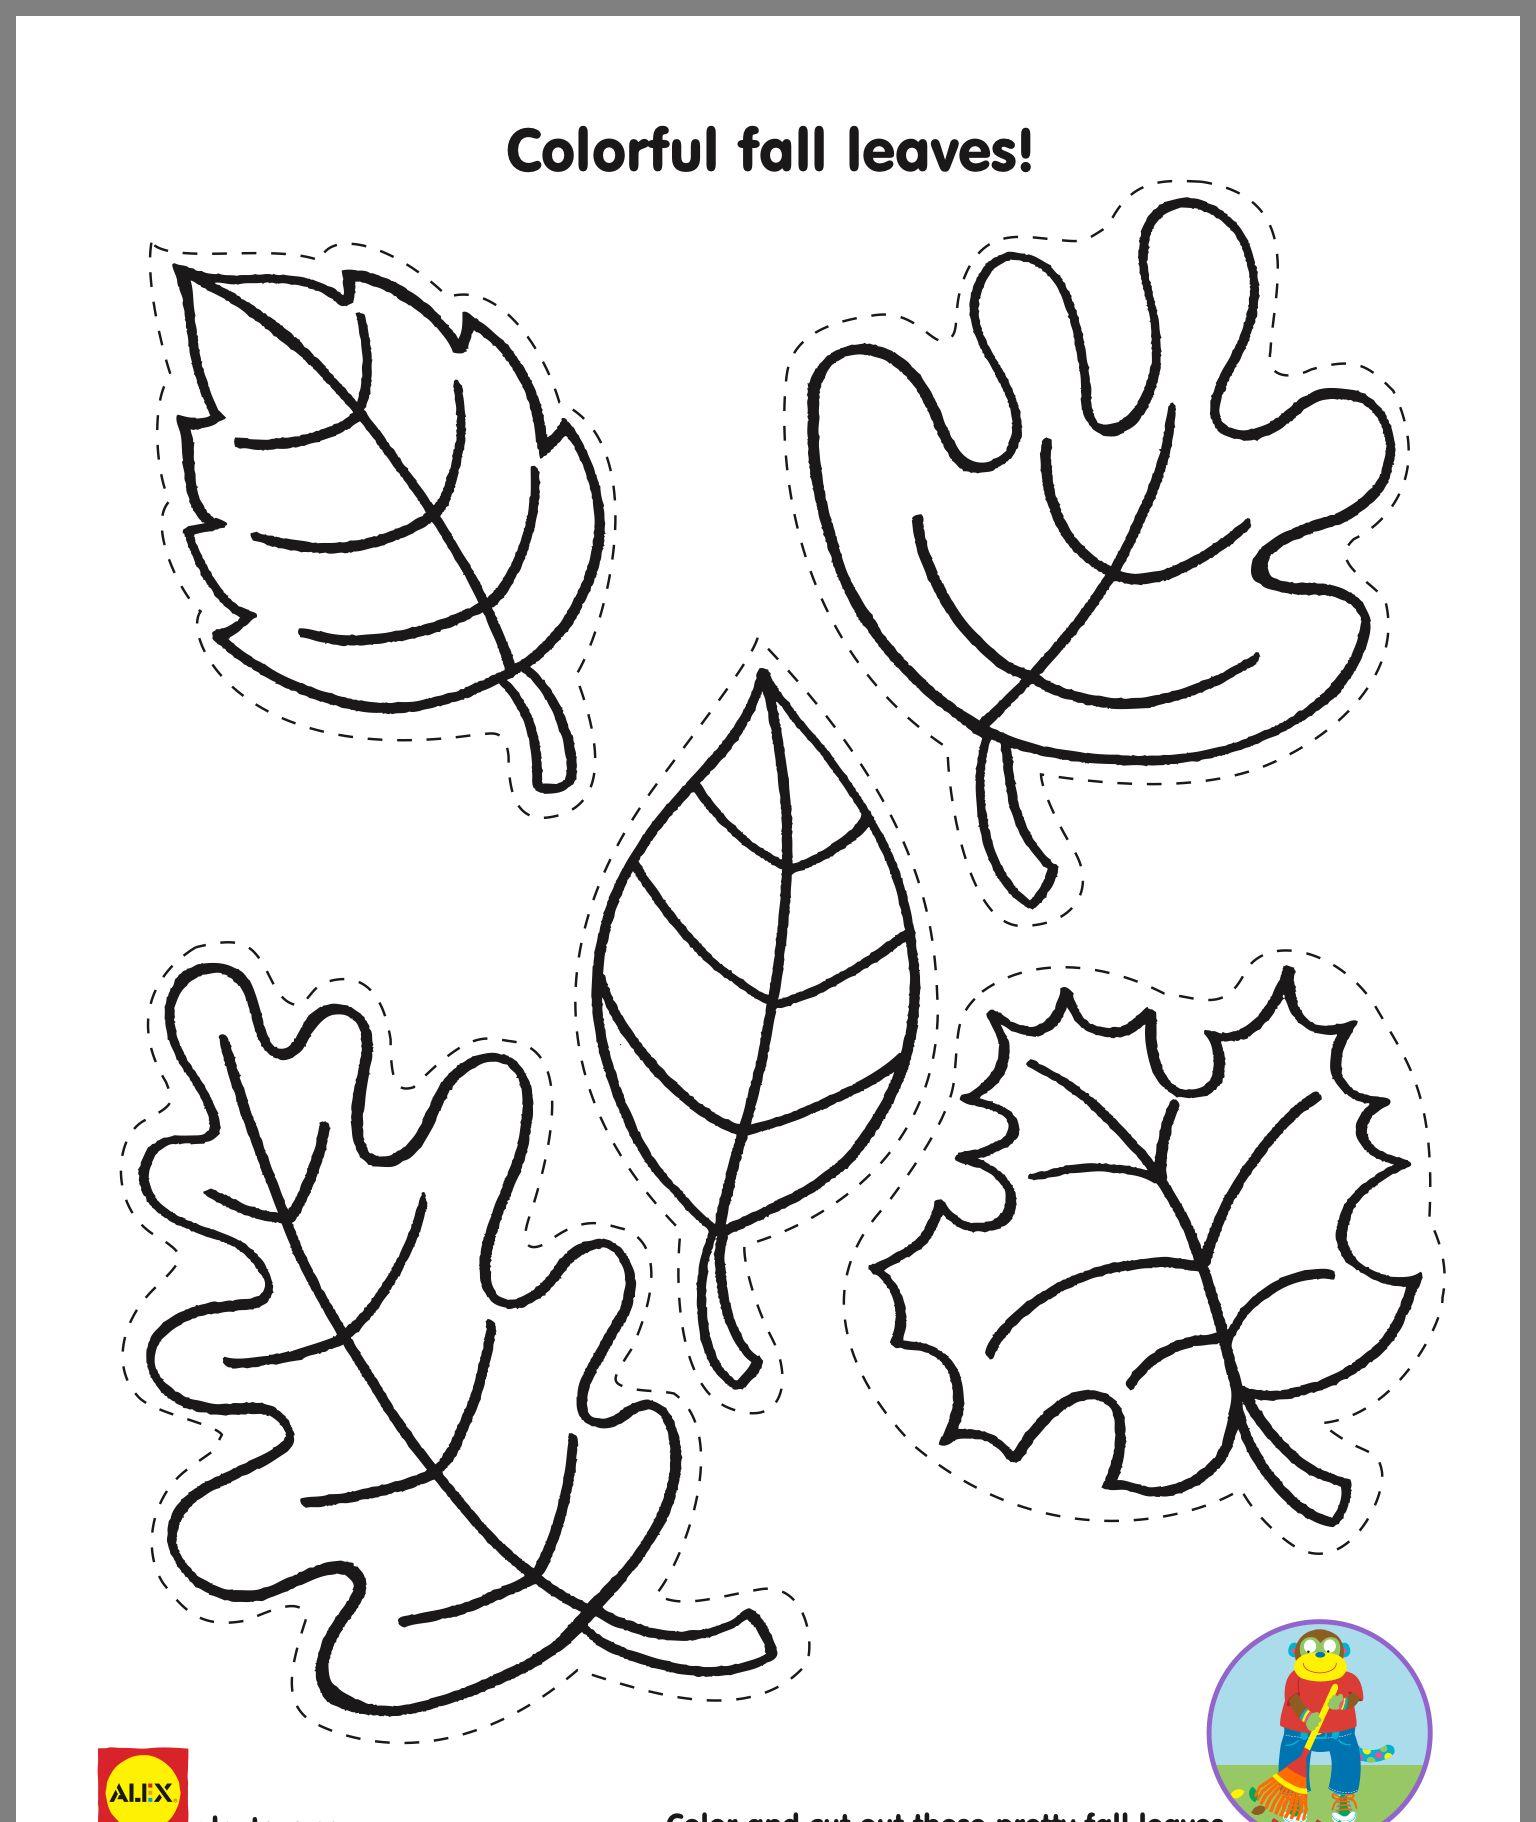 Fall leaf template image by laura shelinsky on Preschool